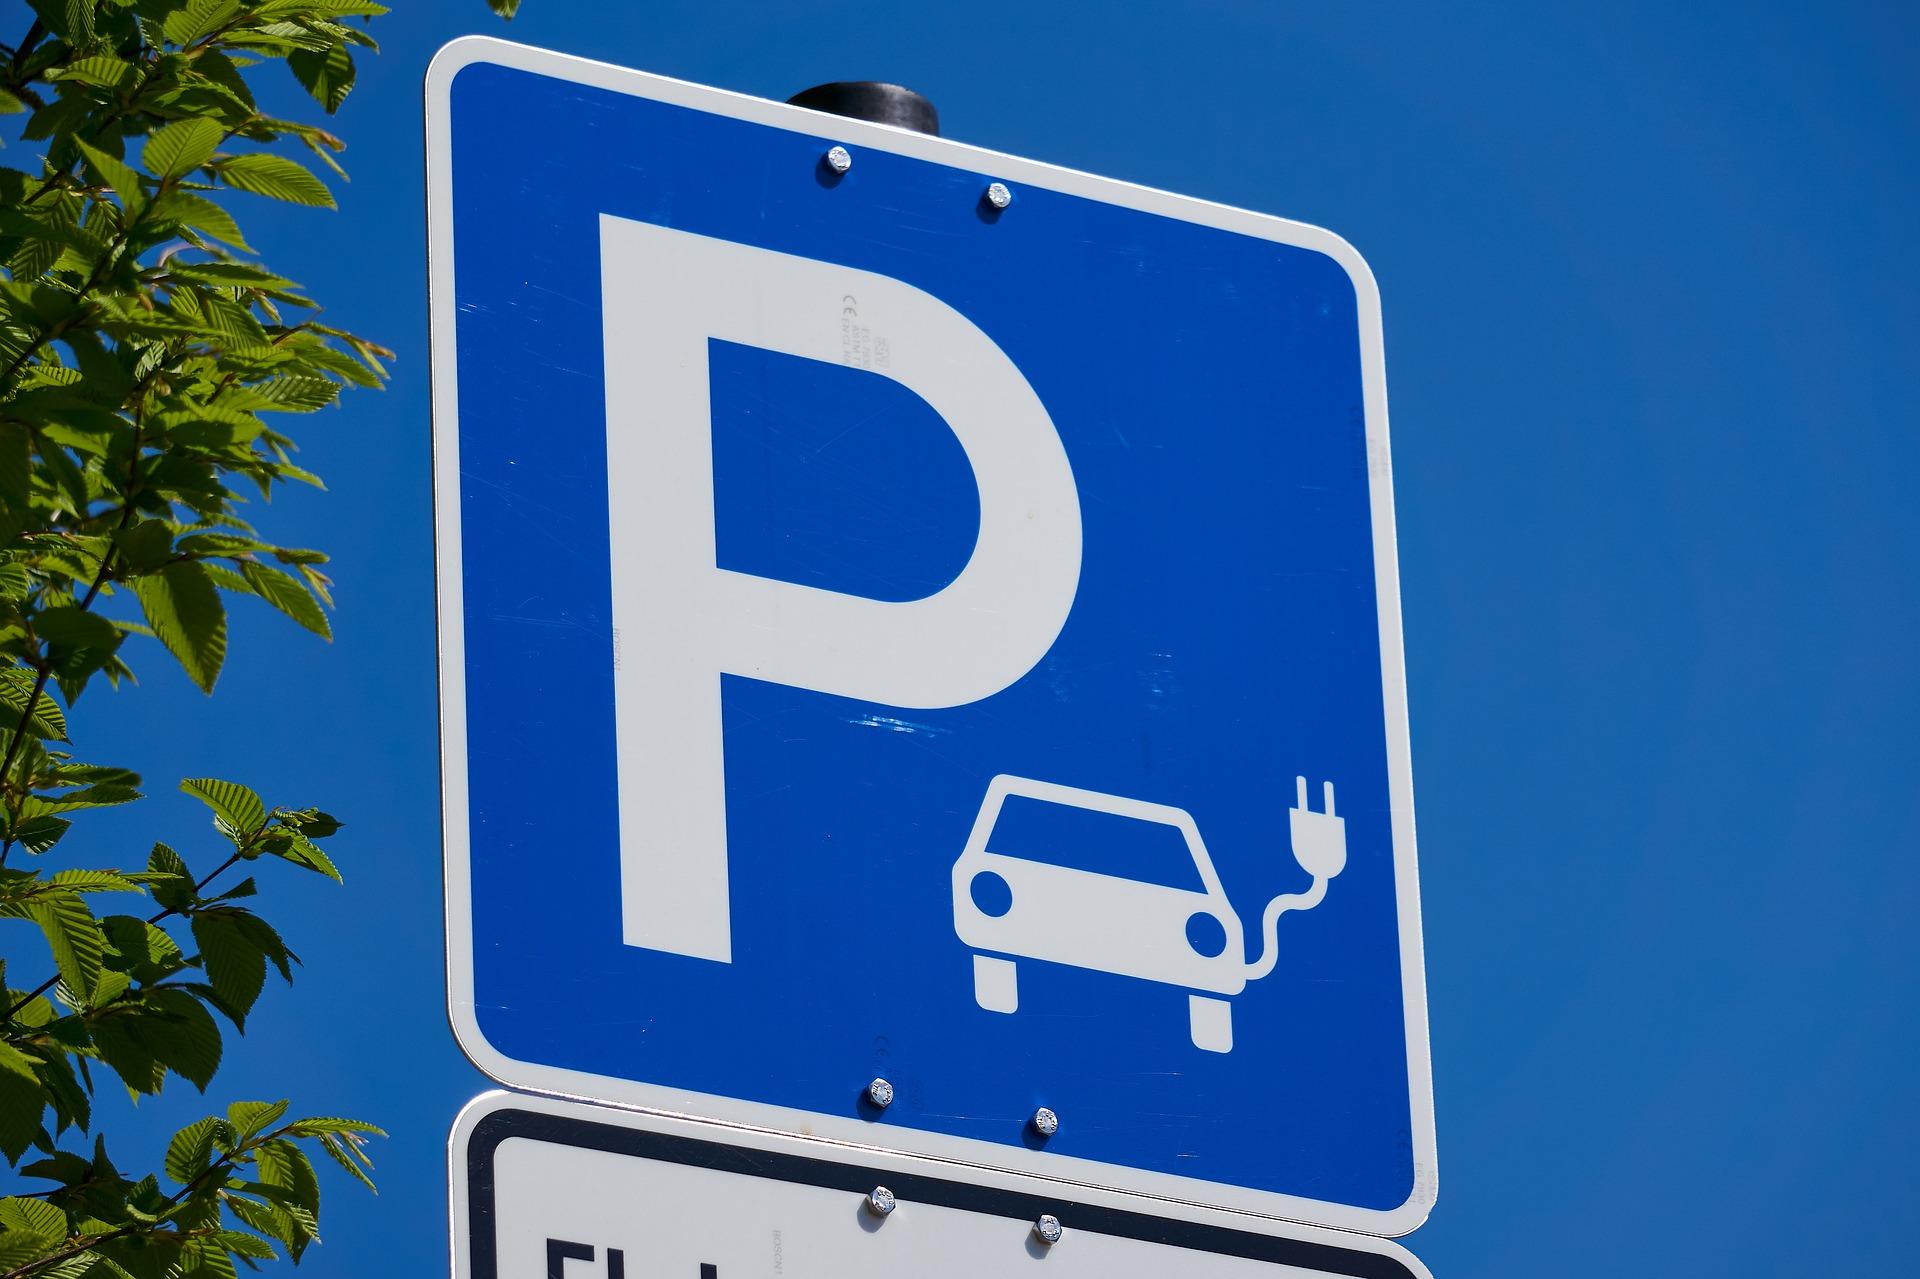 E-Auto braucht spezielle Kfz-Versicherung. Symbolbild: Markus Distelrath via Pixabay